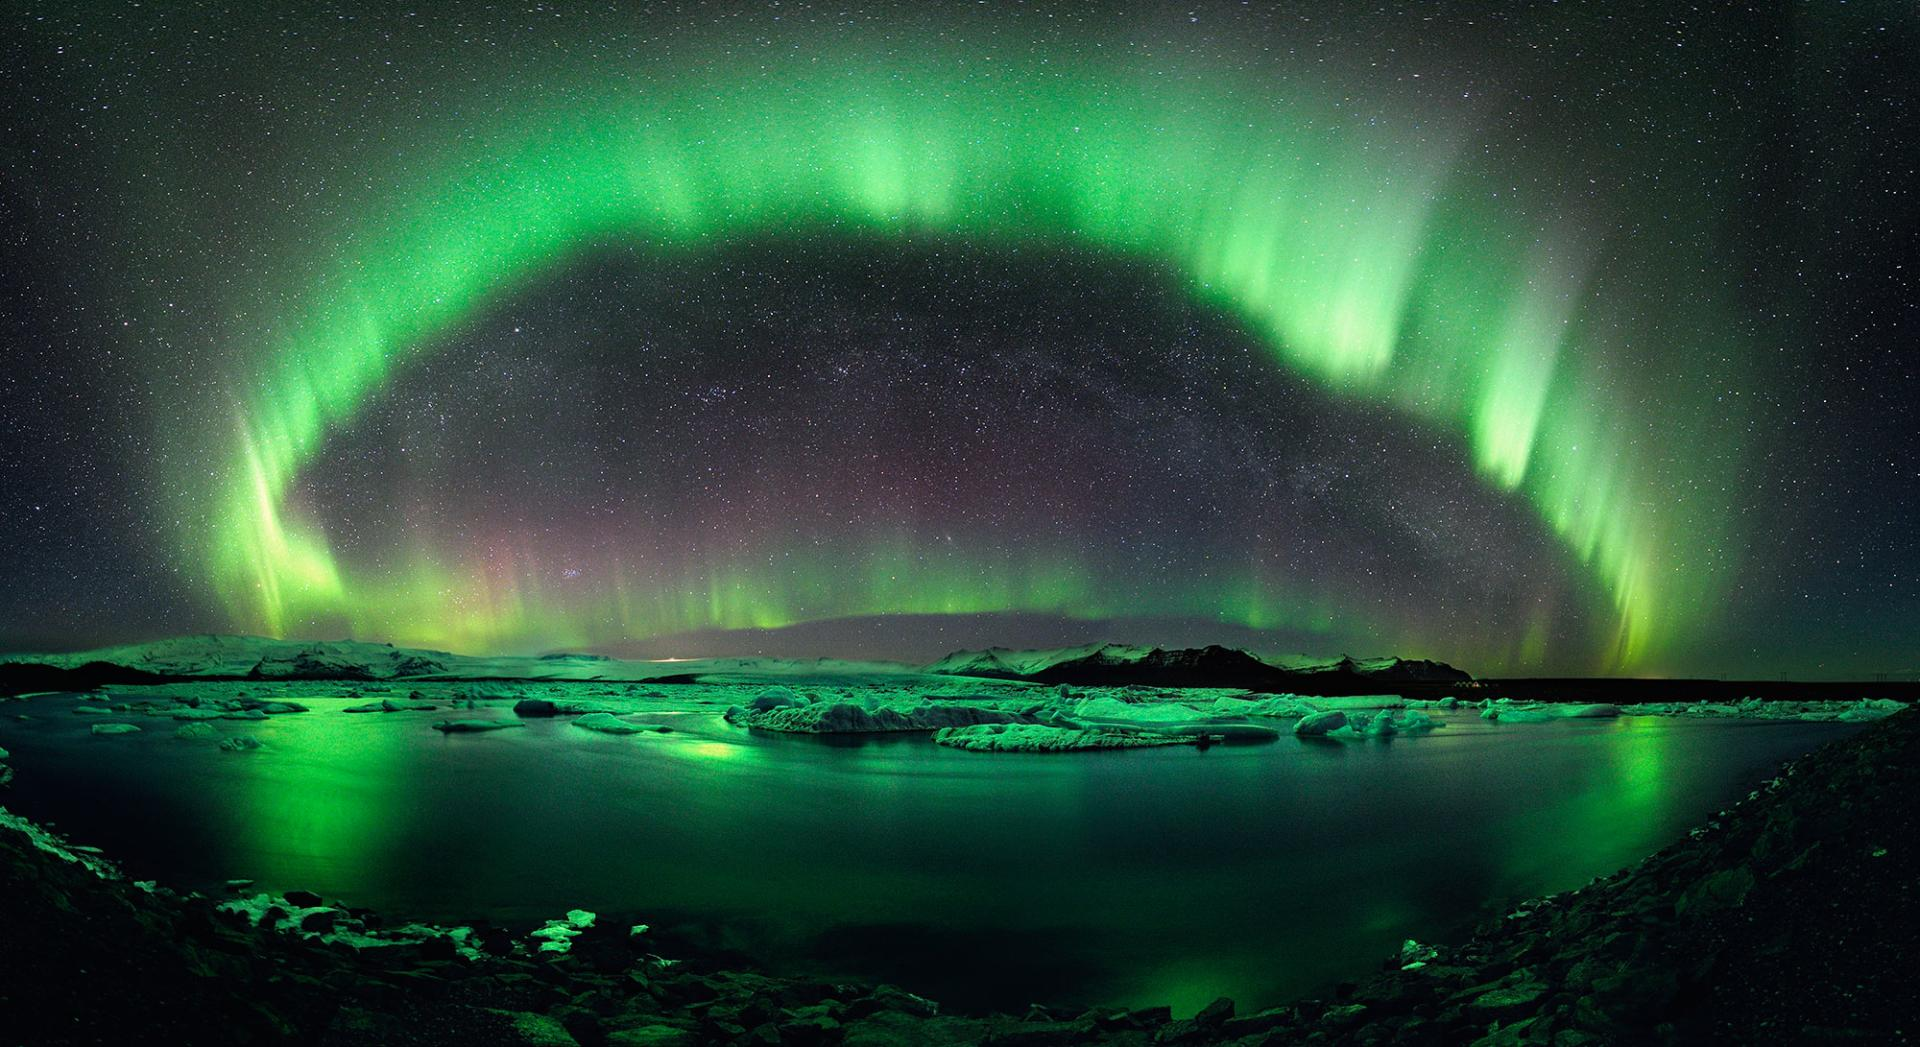 Aurora Borealis wallpapers HD quality